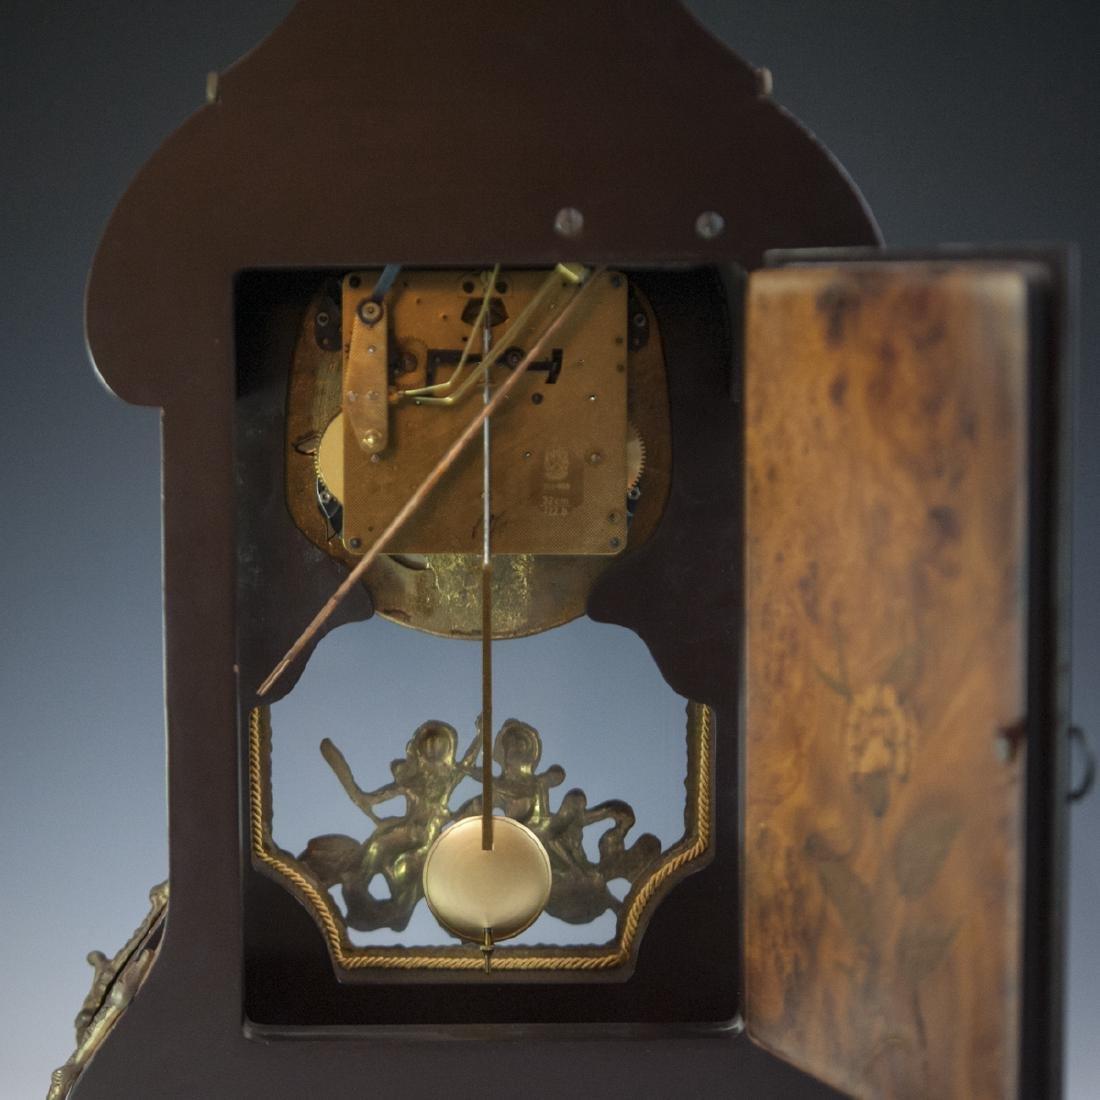 Franz Hermle and Sohn Marquetry & Bronze Mantel Clock - 4